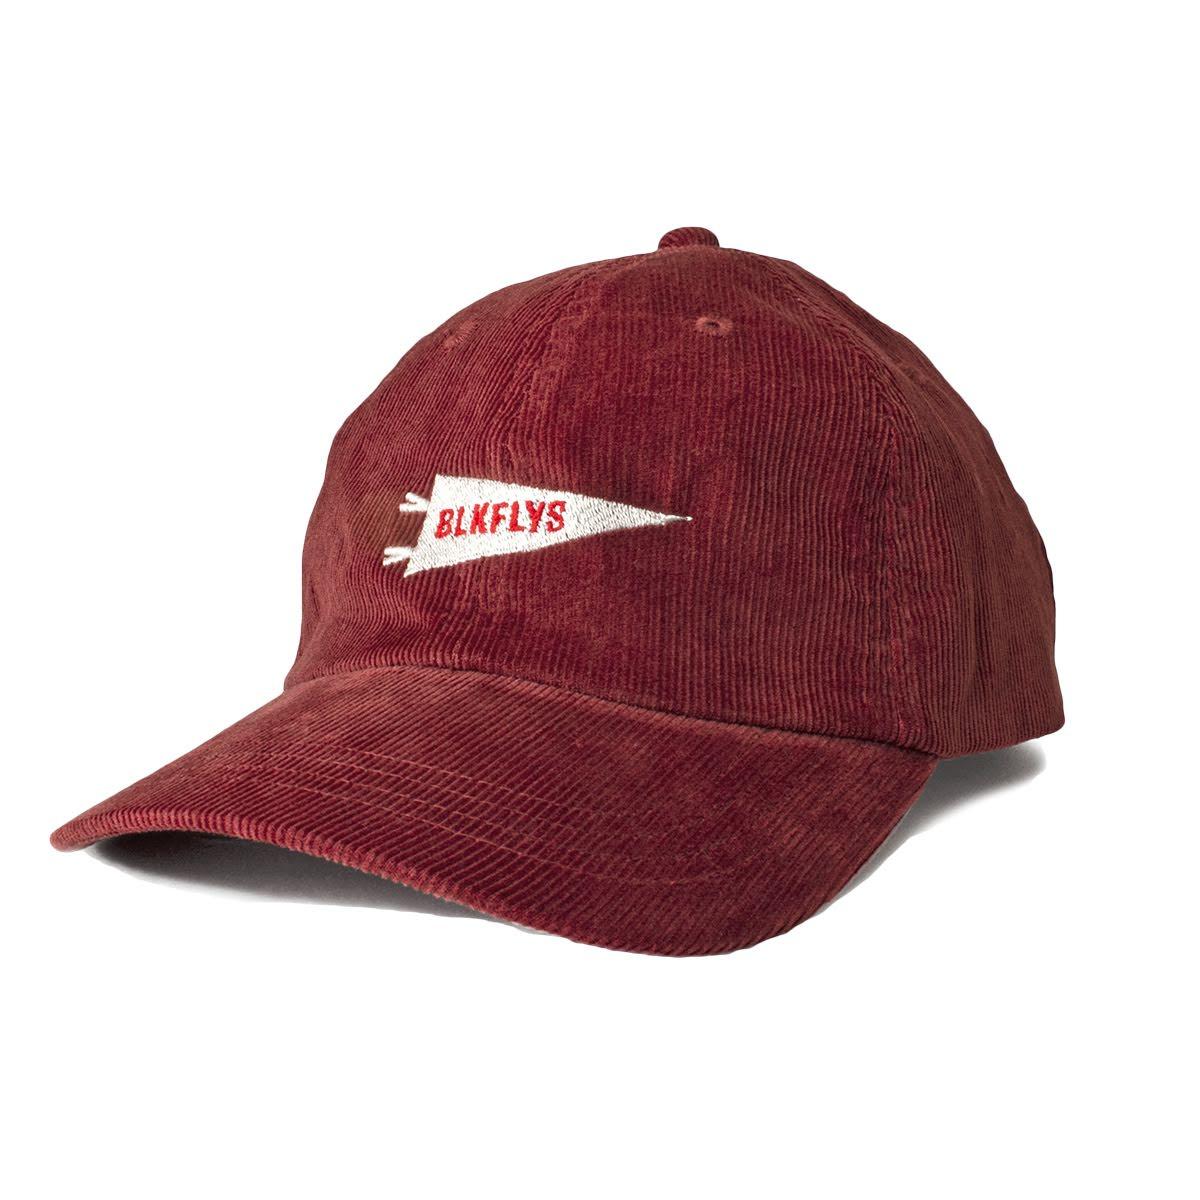 PENNANT CORDUROY BASEBALL  CAP